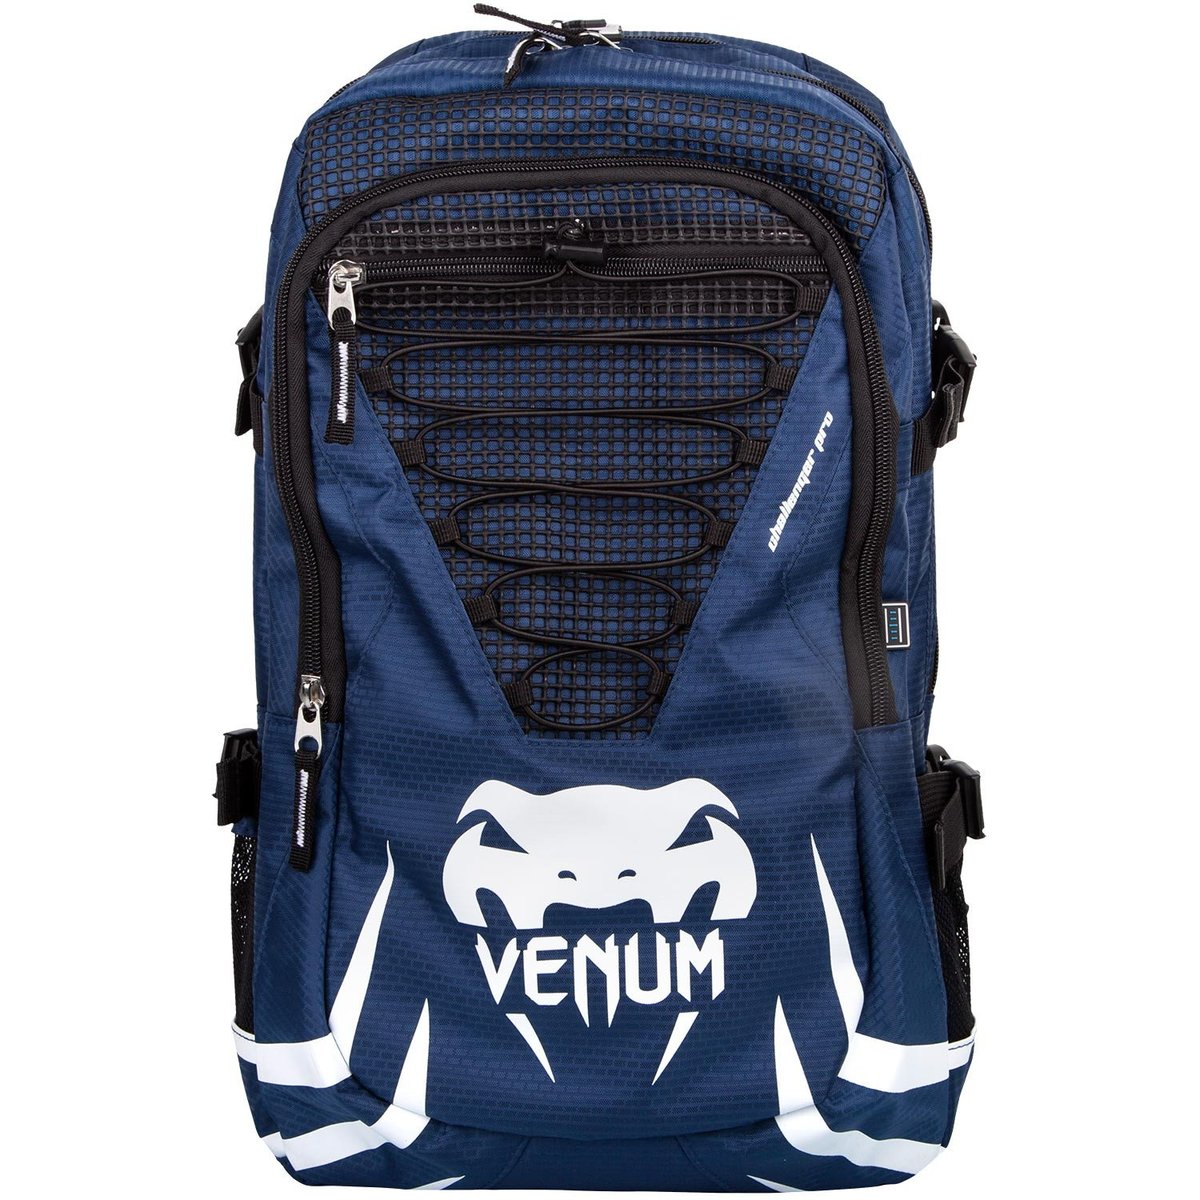 batoh VENUM - Challenger Pro - Navy Blue / White - VENUM-2122-414